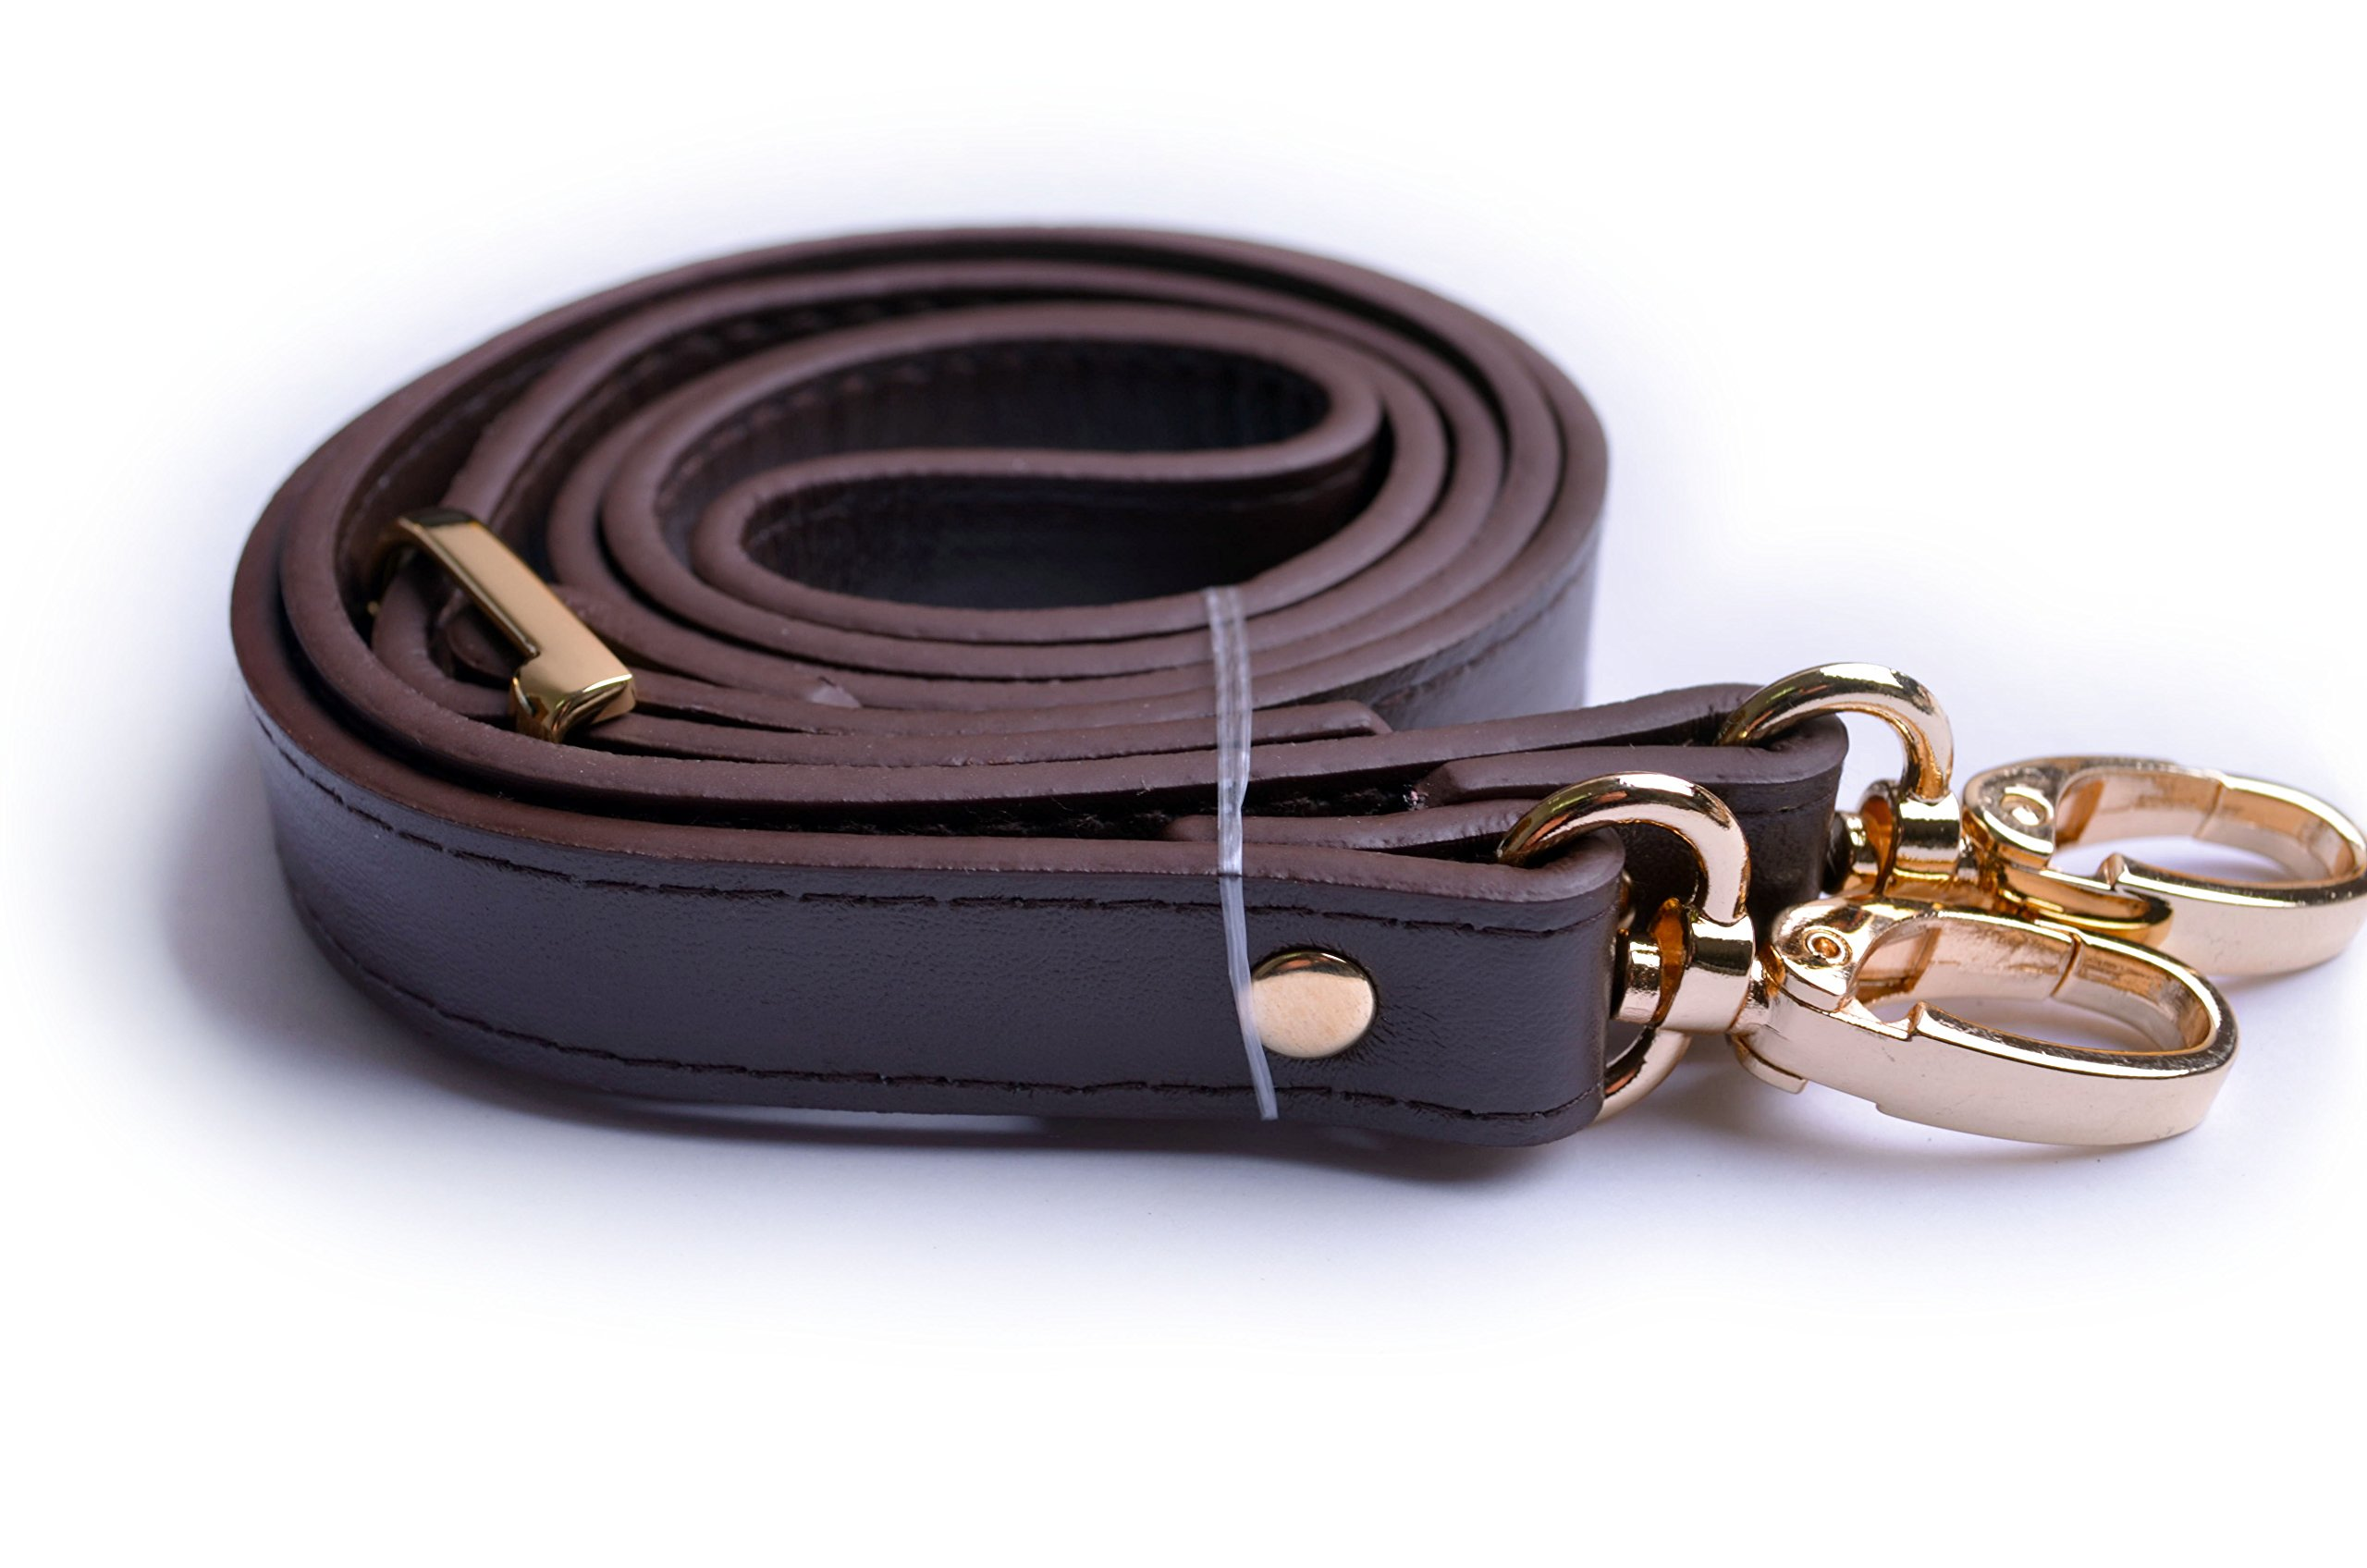 908a56d6a2 Wento 1pcs 43  -49   Dark Brown Faux Leather Adjustable Bag Strap